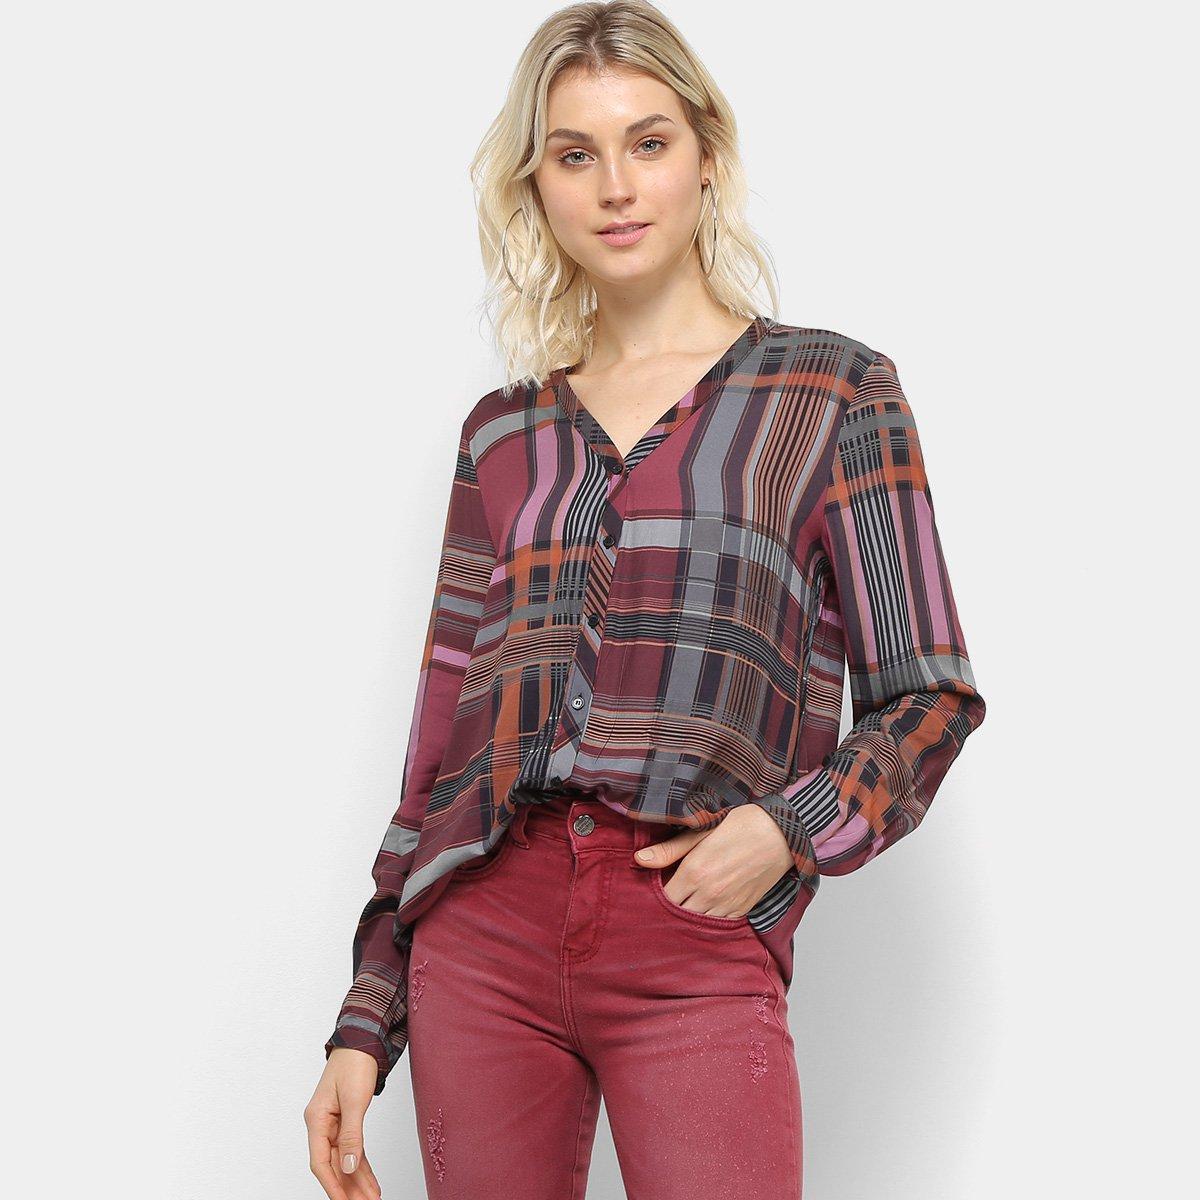 Camisa Manga Longa Colcci Estampada Feminina